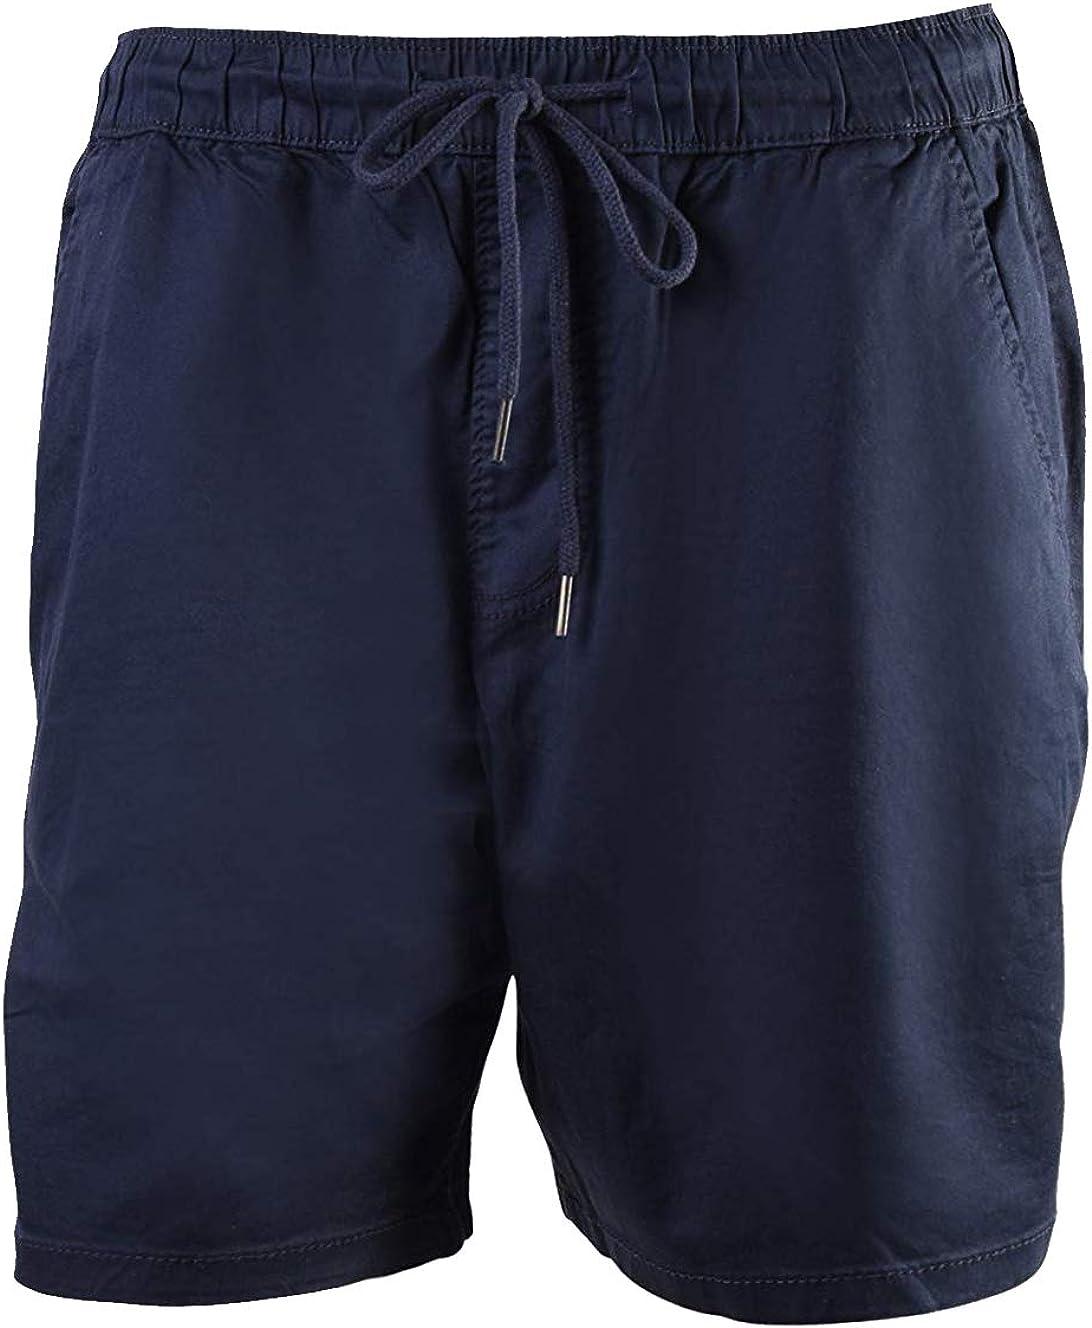 BRPPL Men's Drawstring Shorts